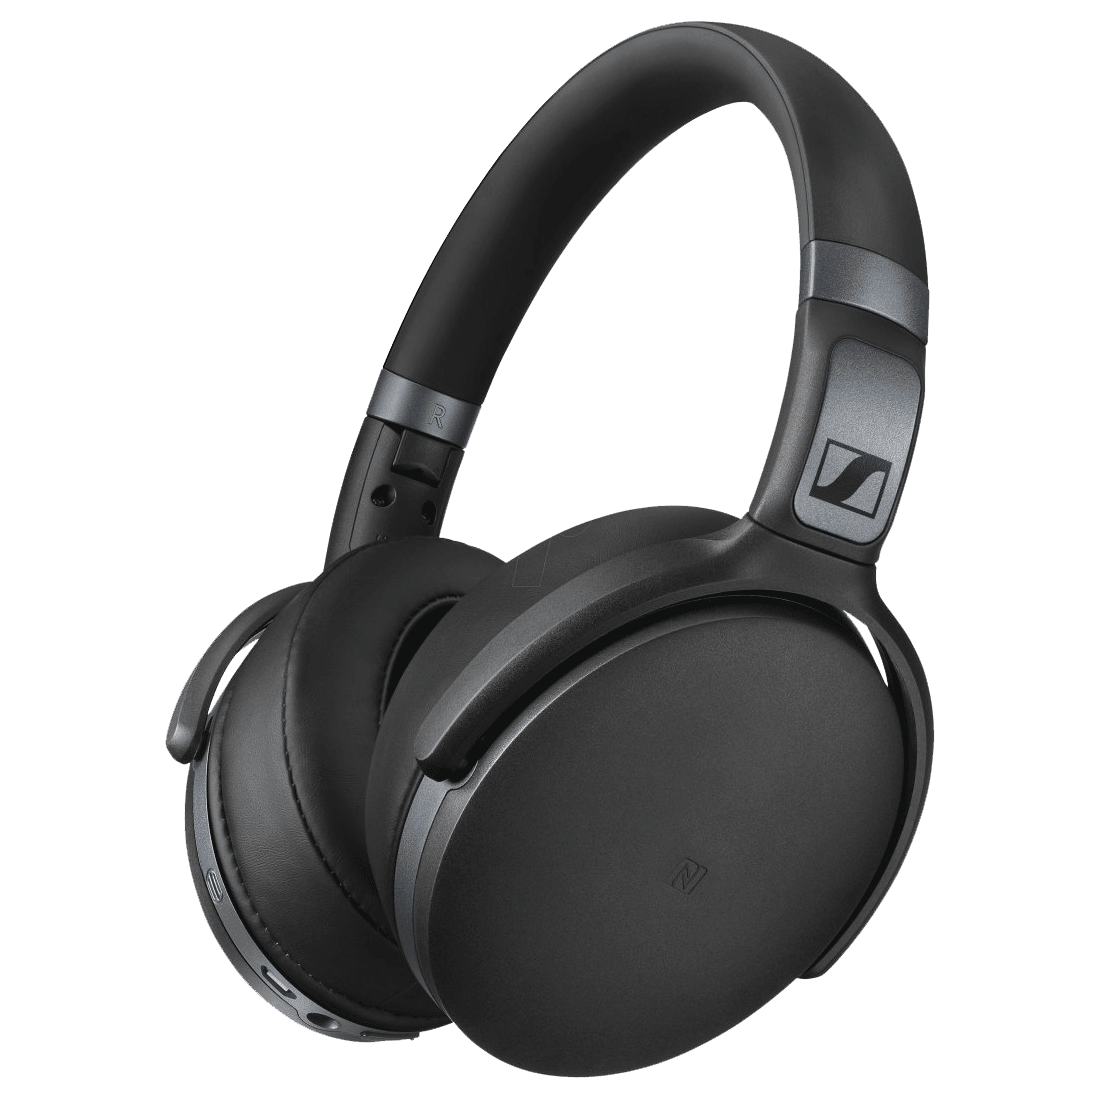 Sennheiser Headphone Transparent Image